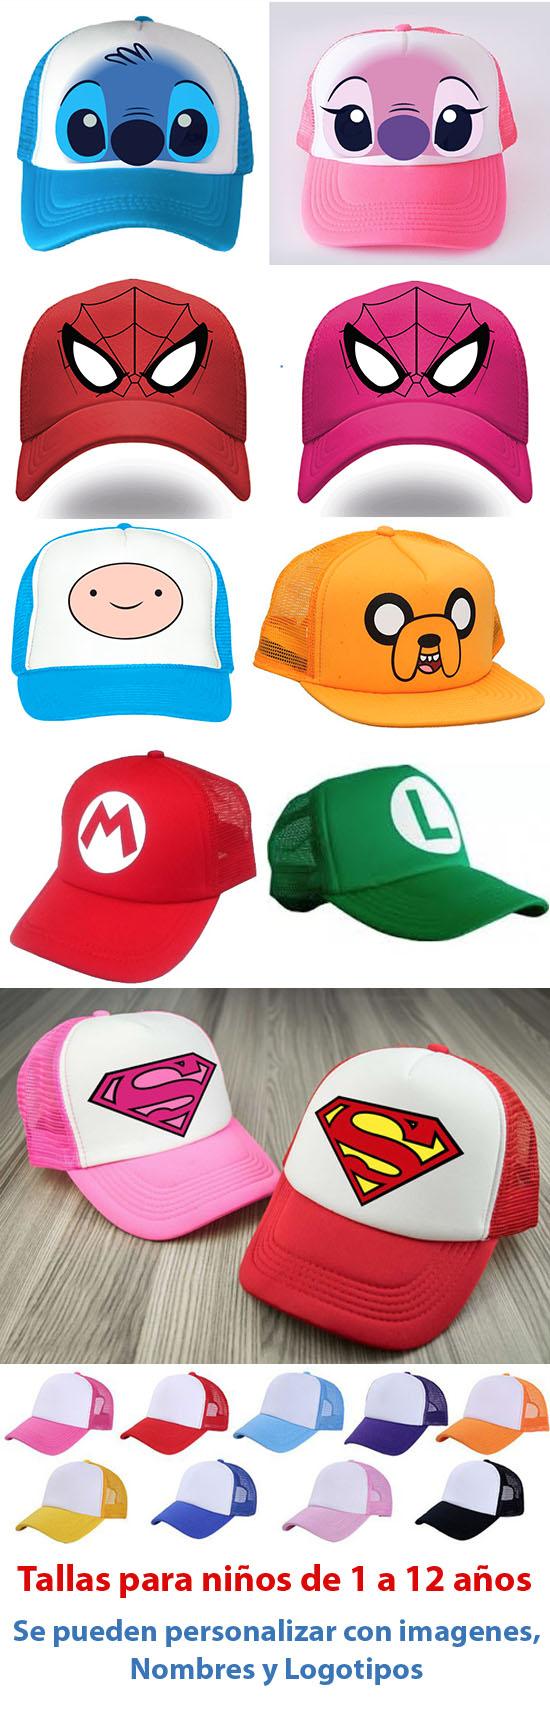 150421e8545c5 Grafiklab obsequios personalizados para niÑos en pachuca gorras para niños  personalizadas jpg 550x1719 Personalizadas gorros para